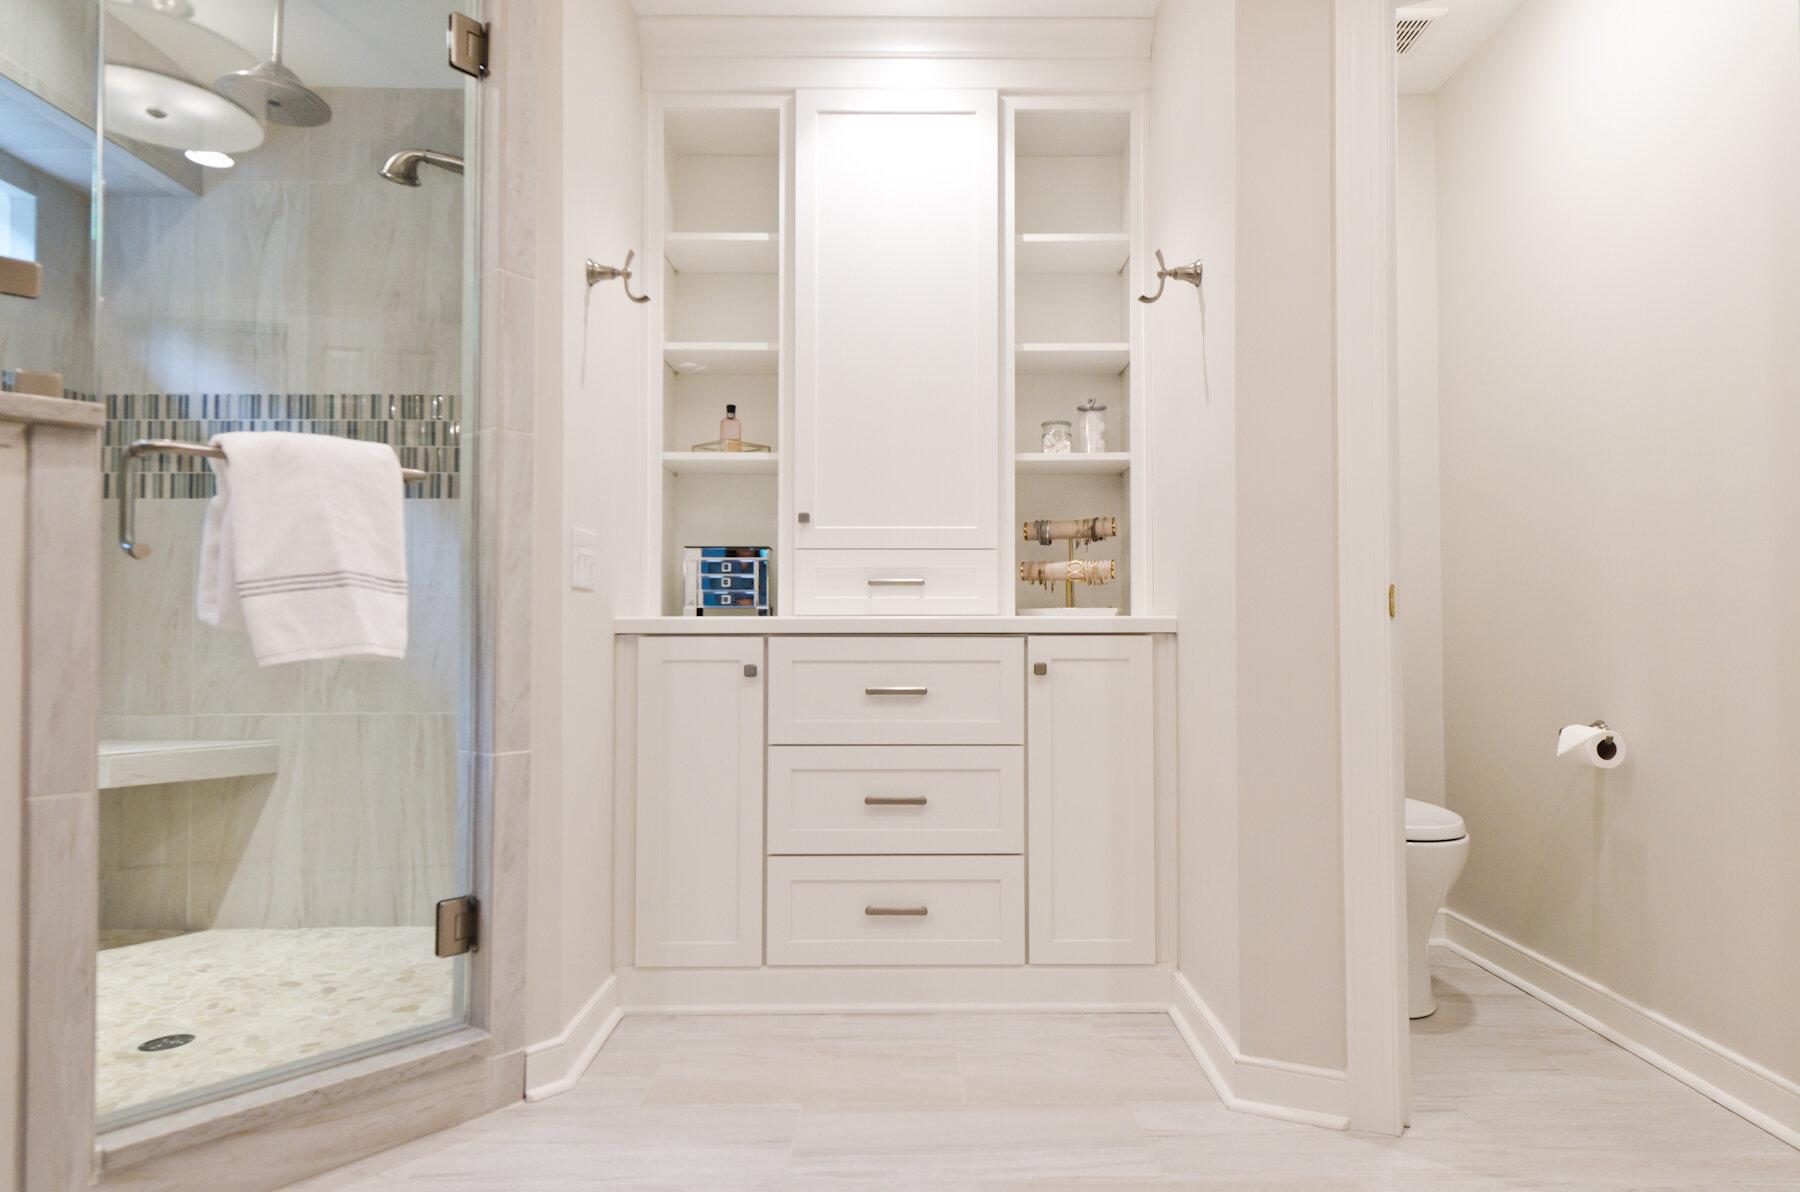 2019_CLI_Richmond_Virginia_Interior_Designer_Contractor_West_End_Master_Bathroom_Ryther-40.jpg